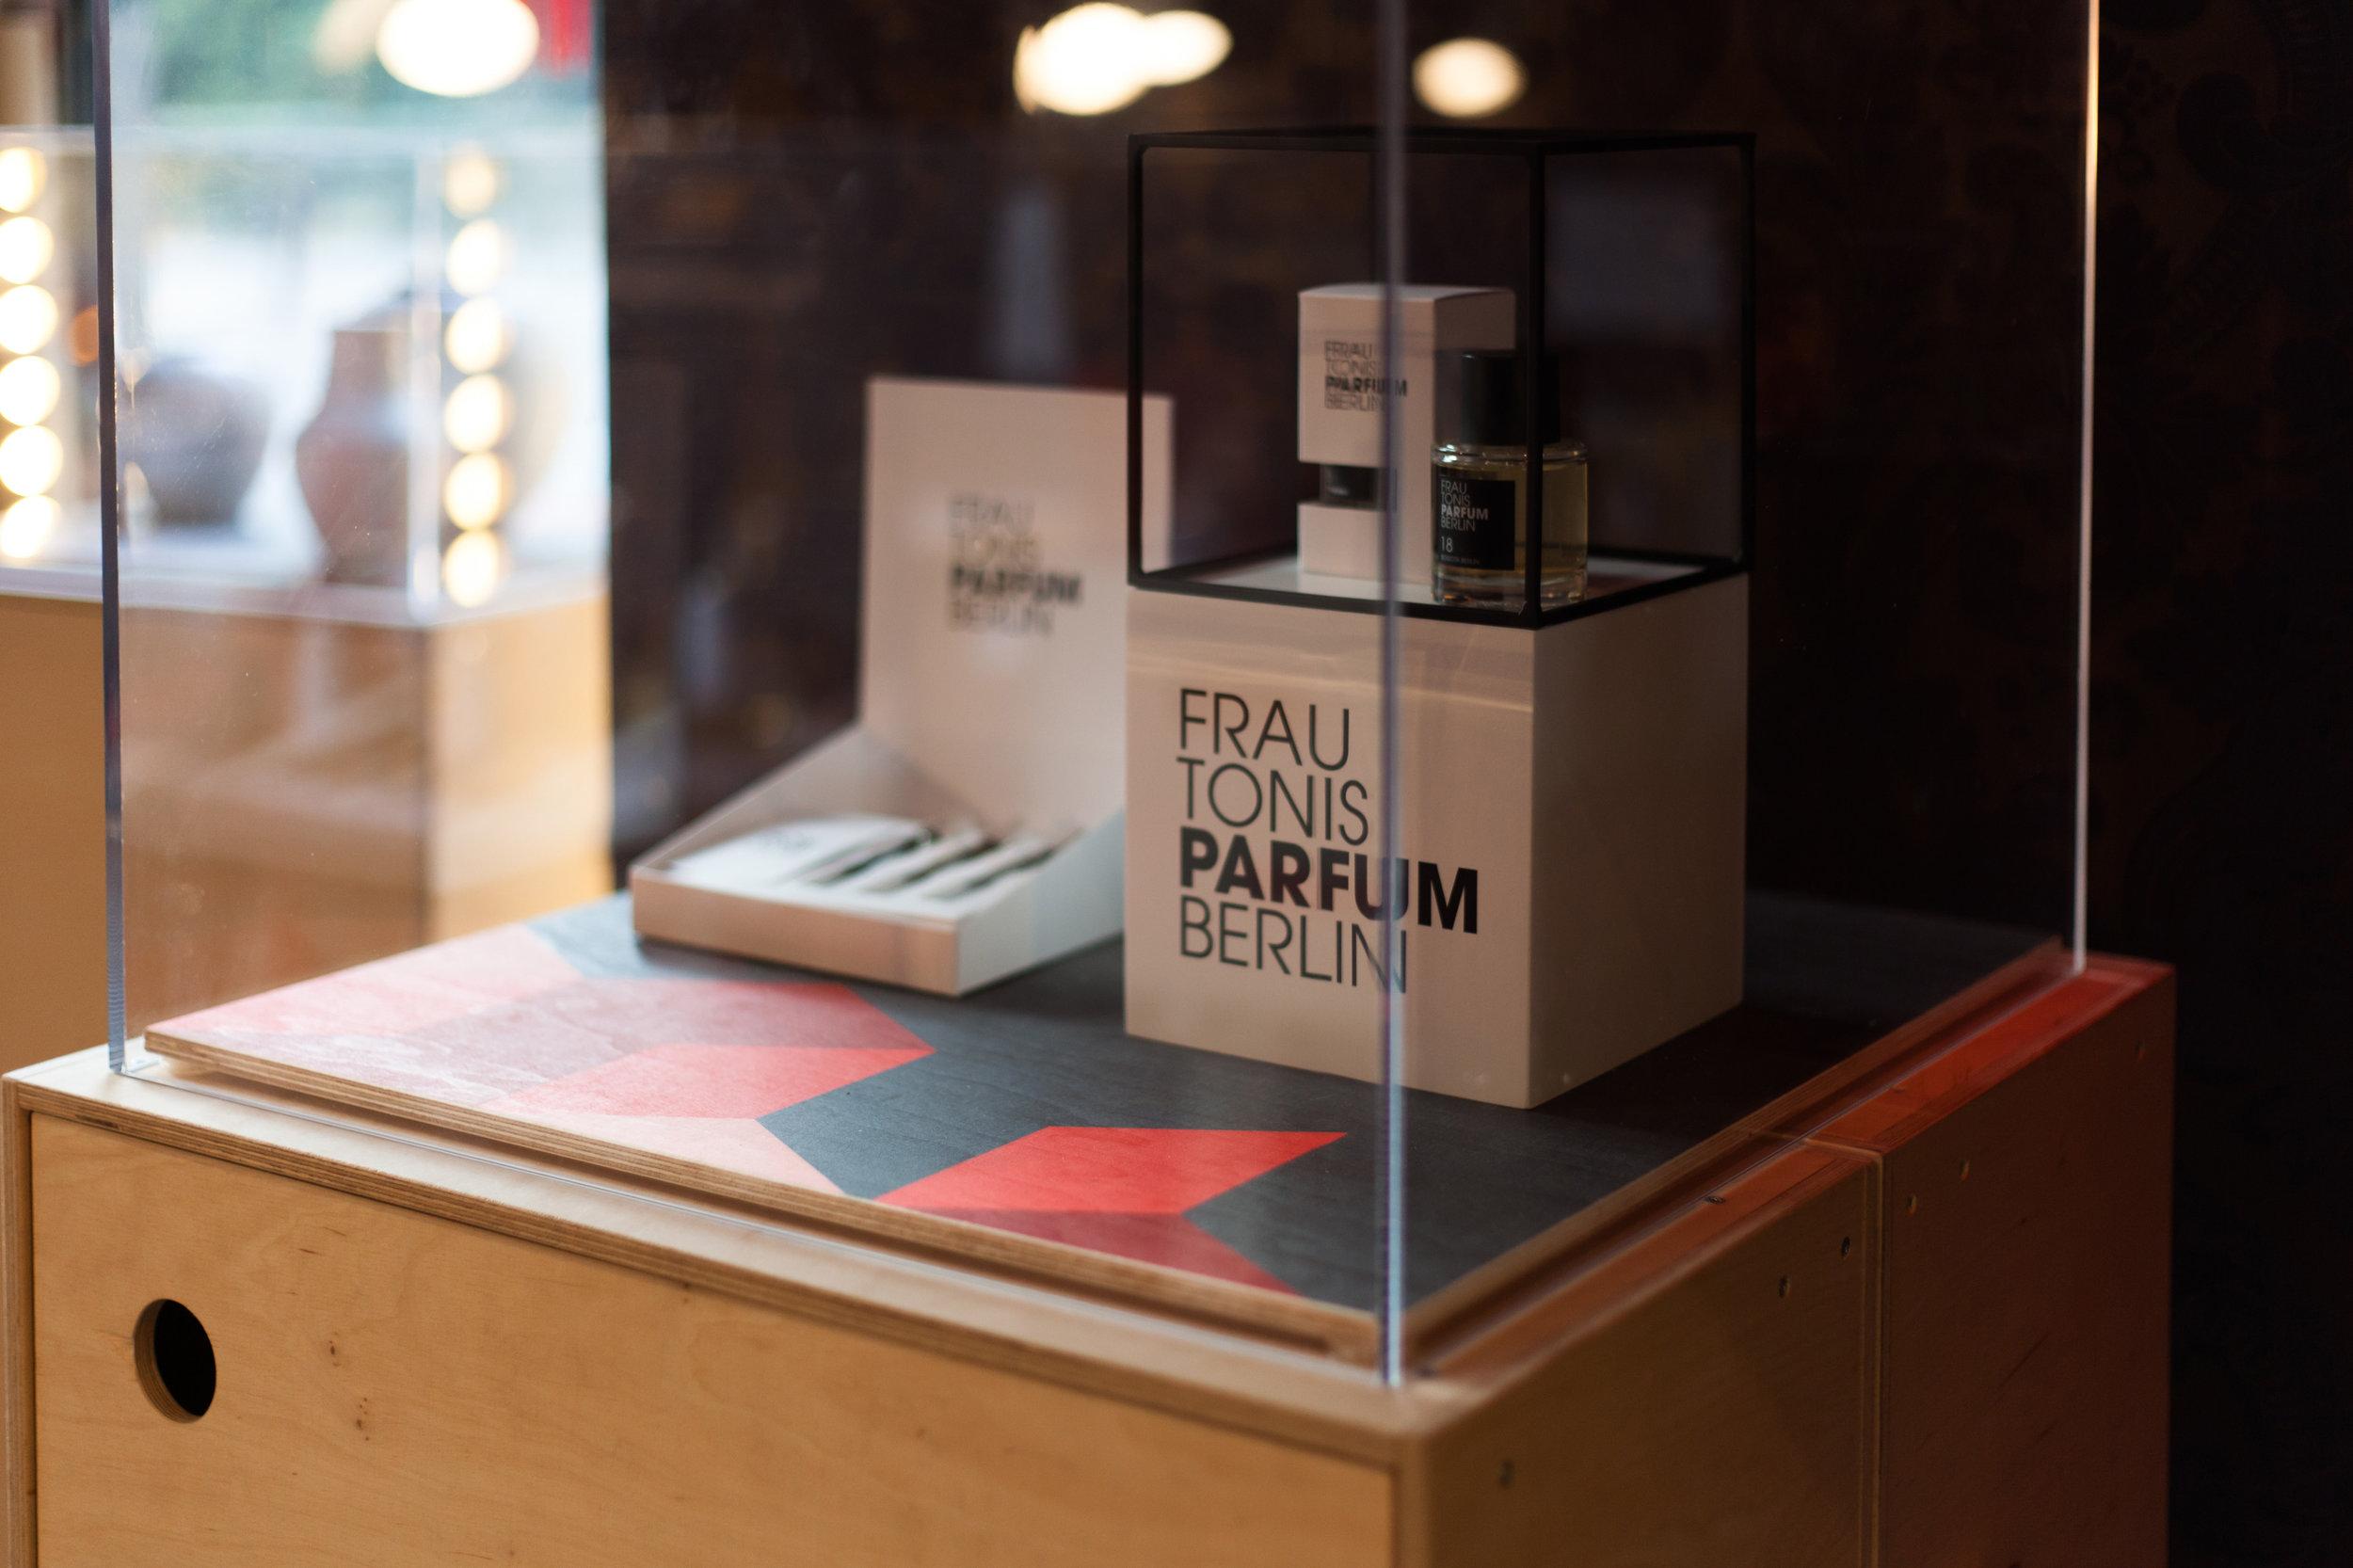 pop-into-berlin_retail-interior-design_coordination-berlin_07.jpg